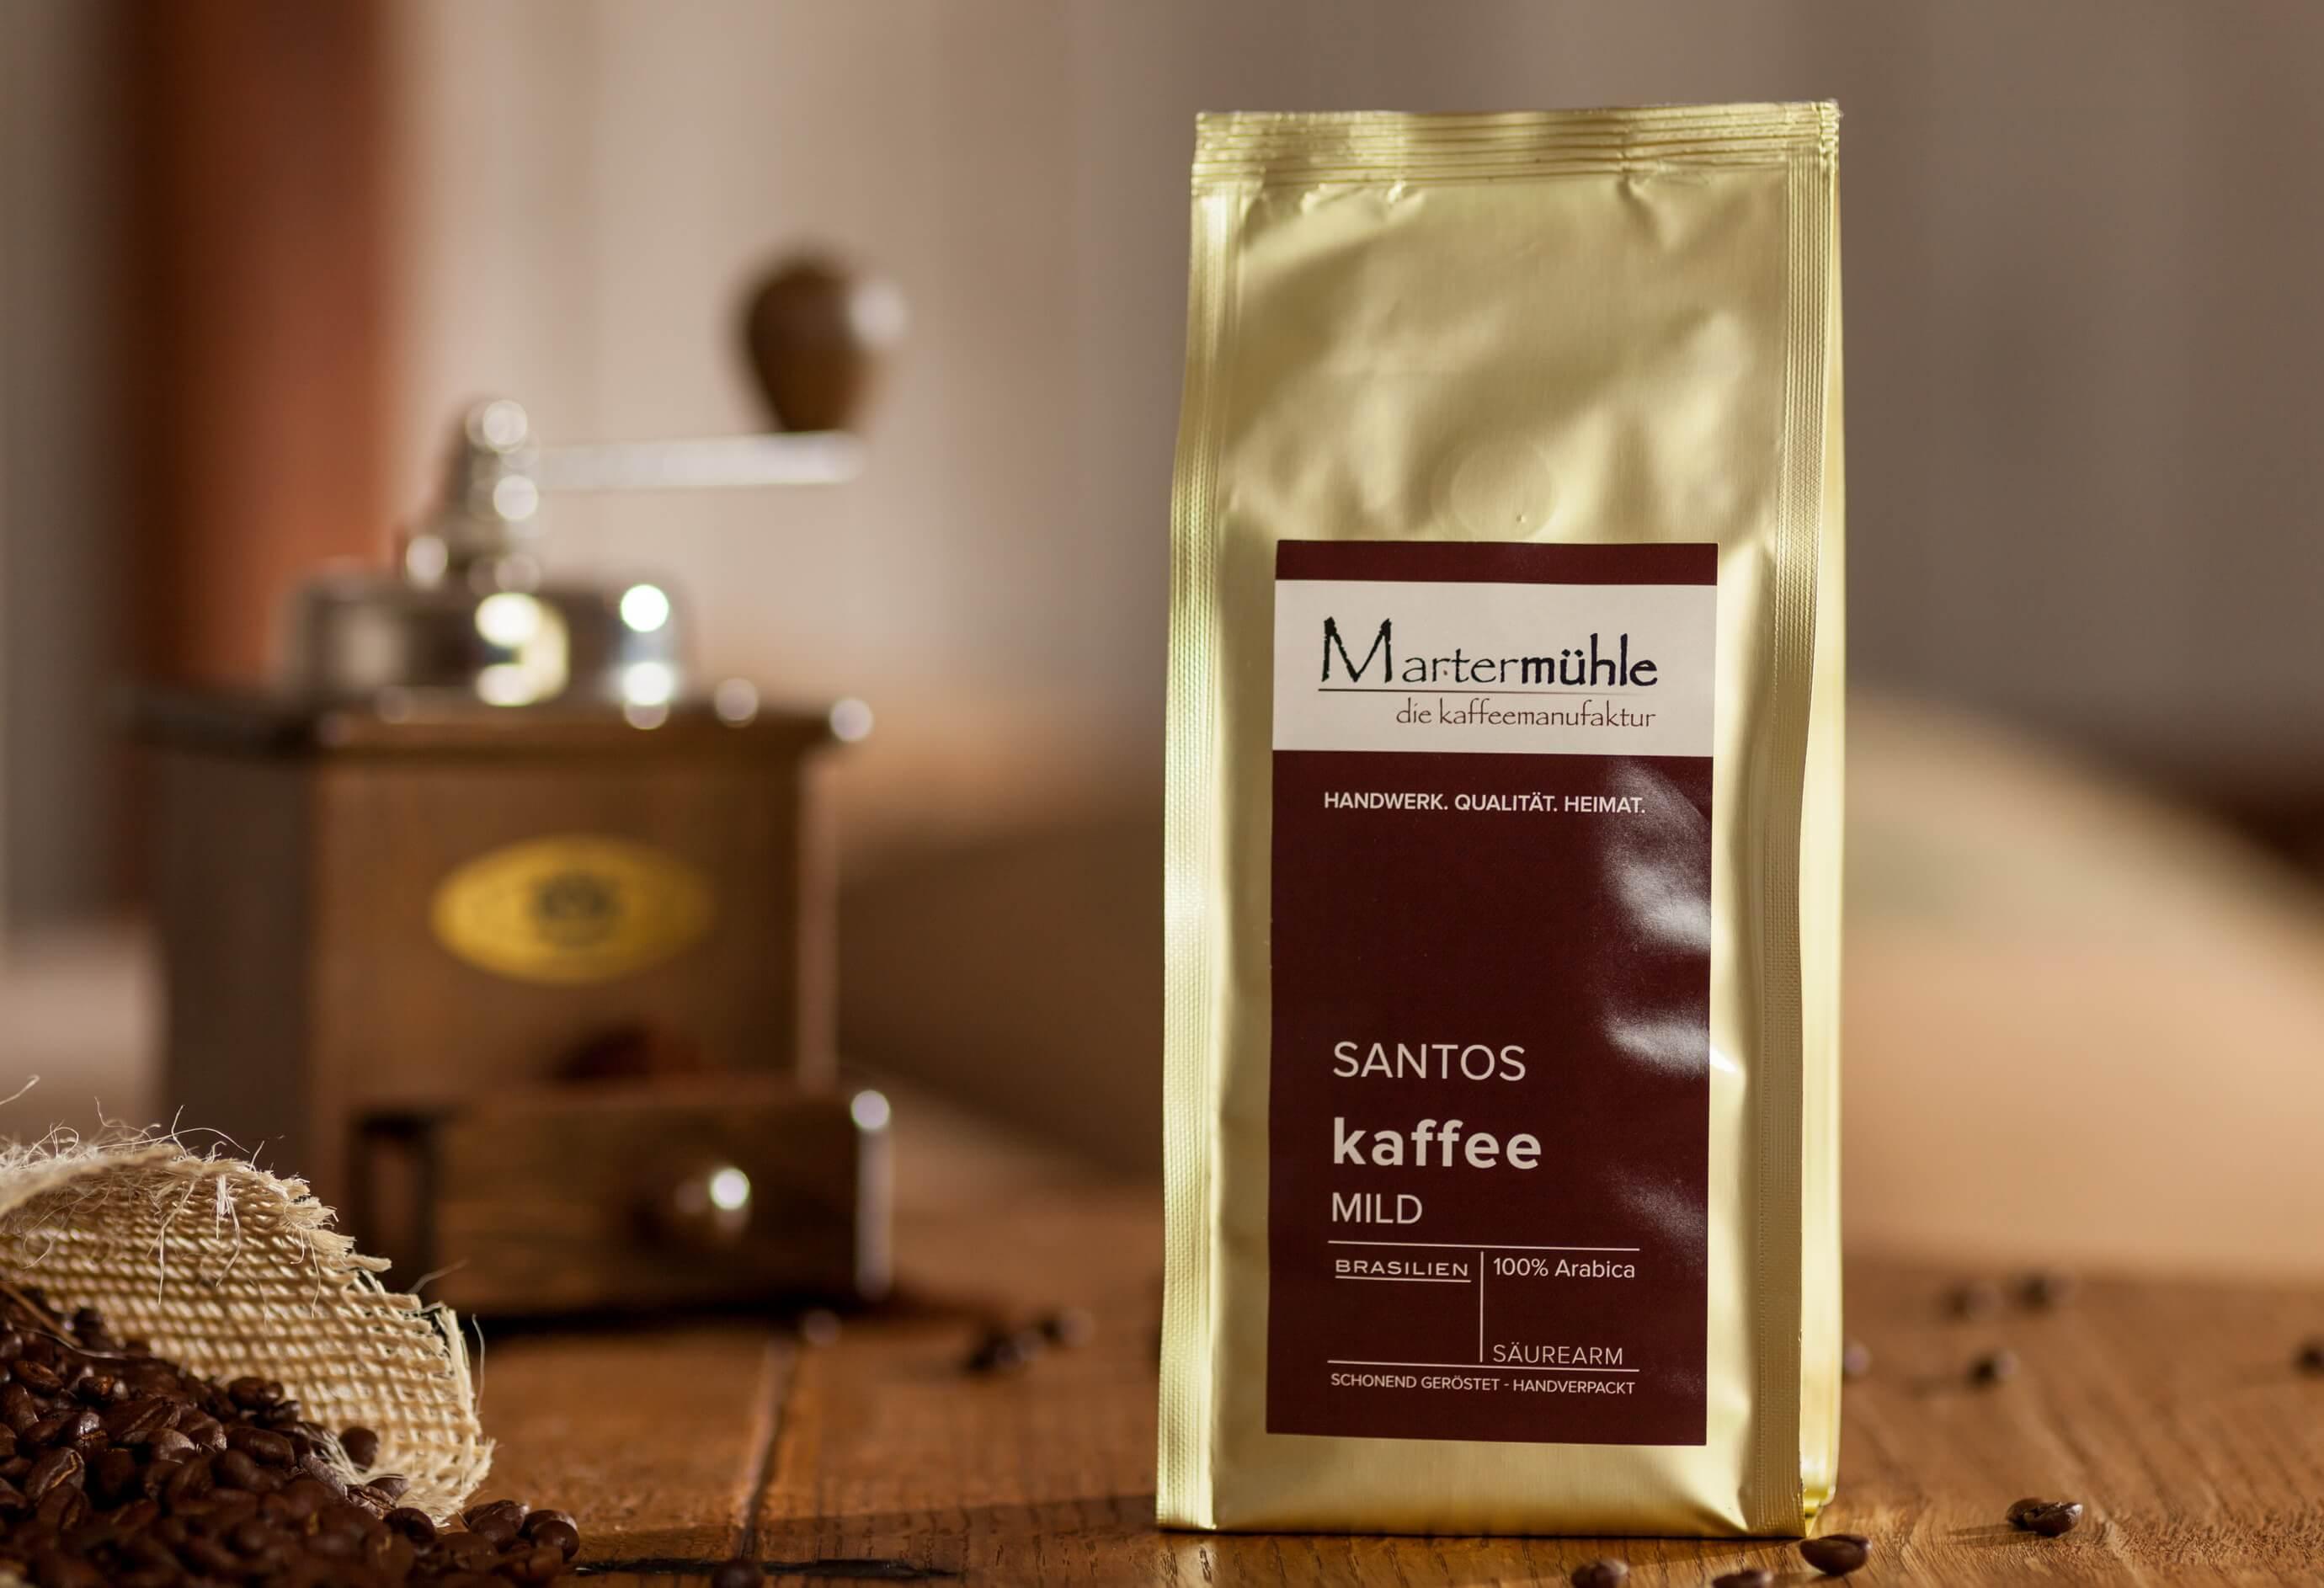 marterm hle santos kaffee kaufen kaffeer sterei marterm hle. Black Bedroom Furniture Sets. Home Design Ideas